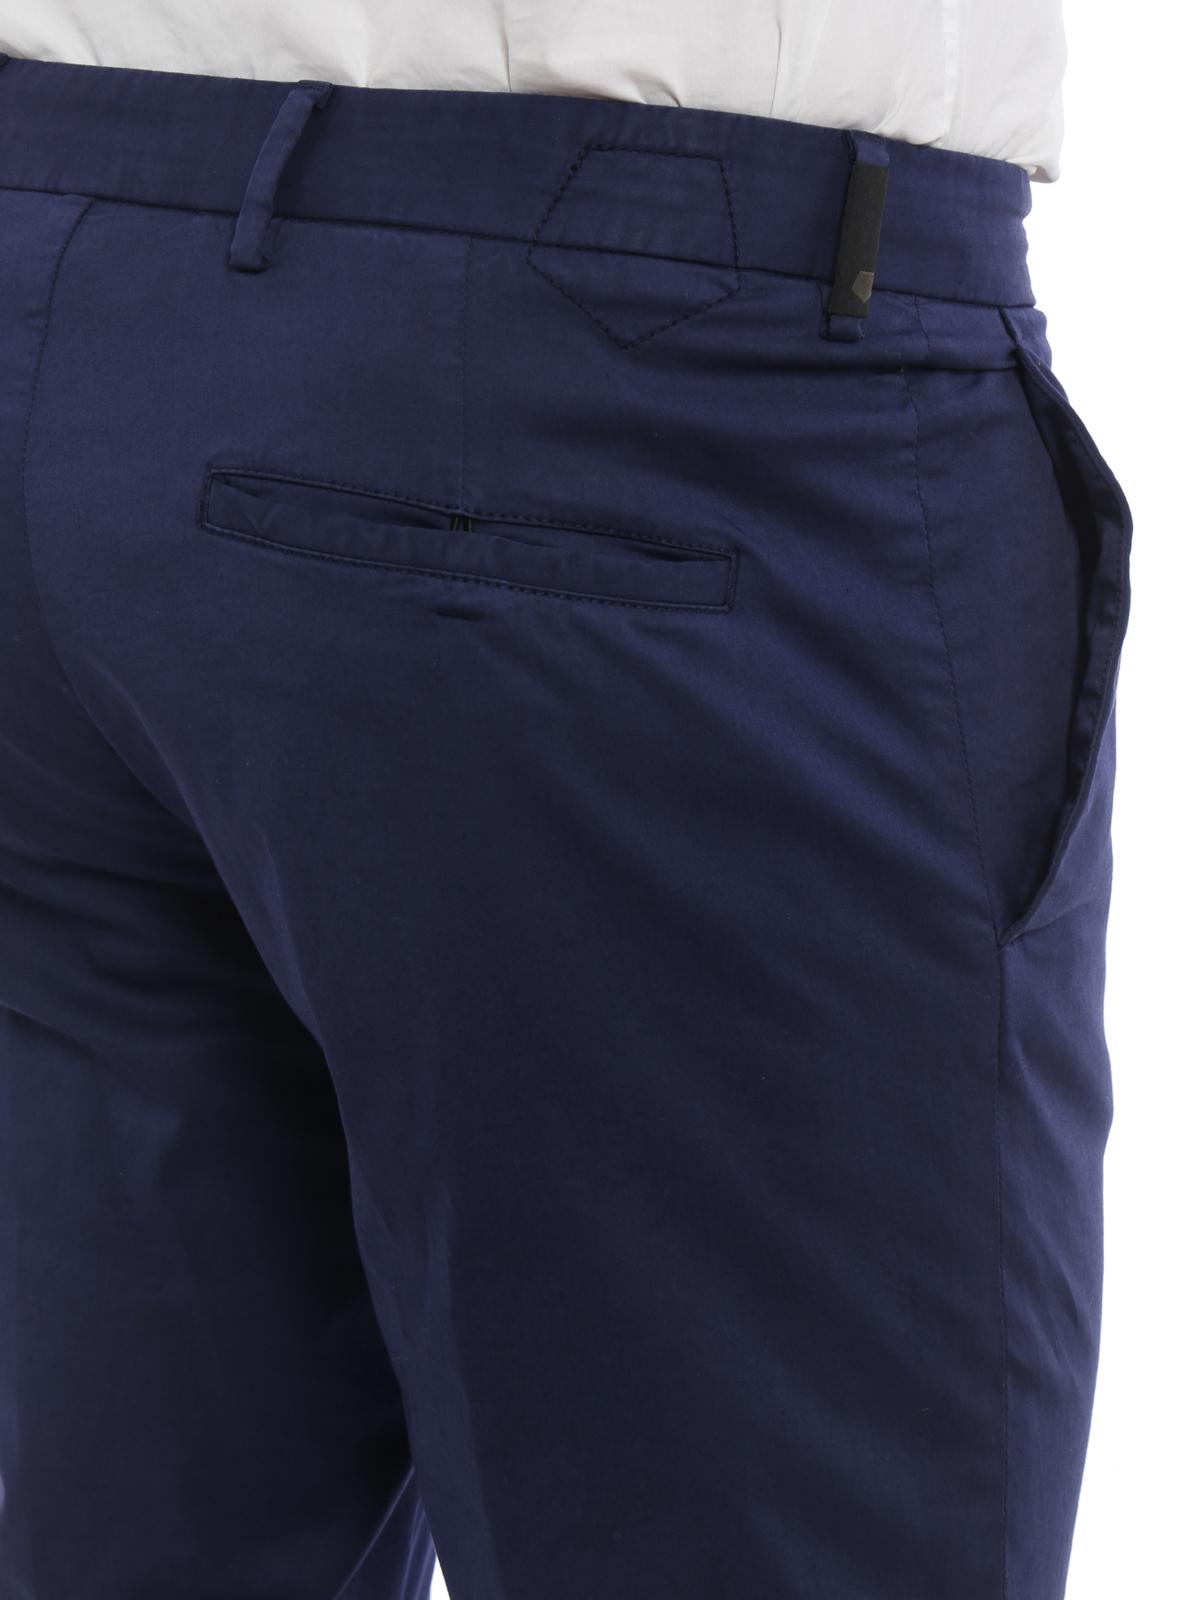 Z Zegna - Pantaloni slim in cotone - pantaloni casual - VM108 ZZ357 B08 43e72a218be